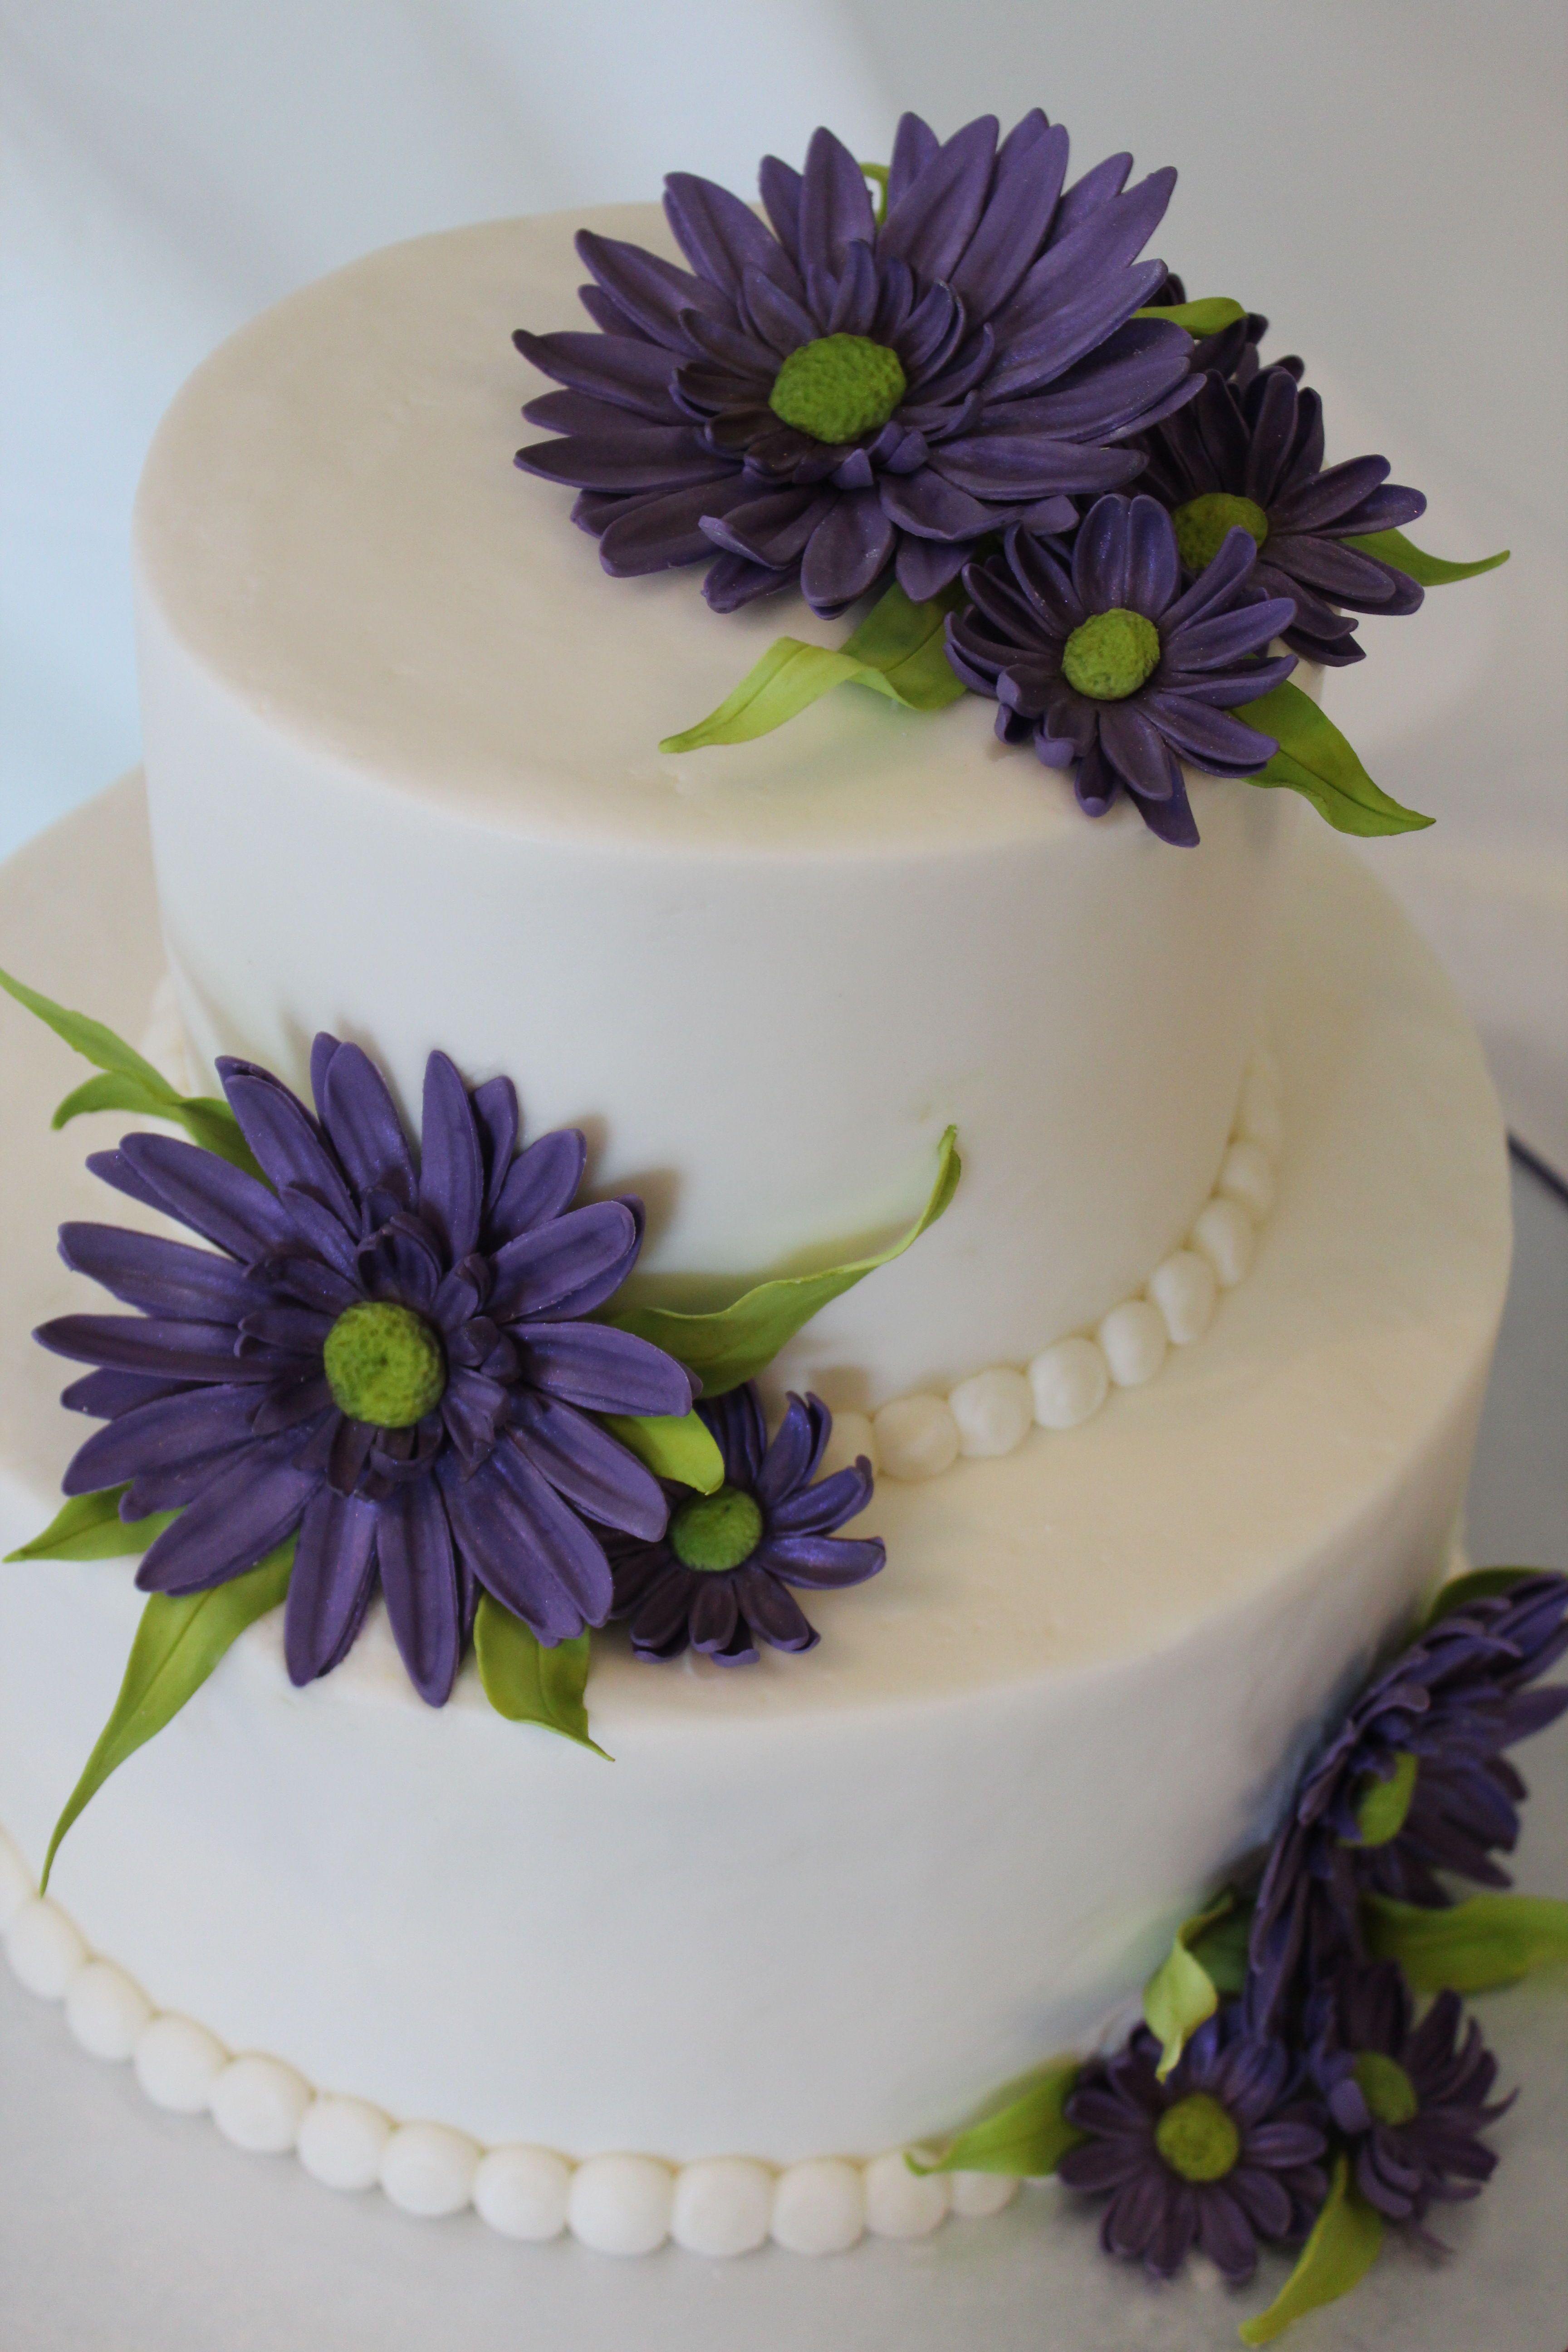 Purple Daisy Cake Buttercream Cake With Gum Paste Daisy Flowers